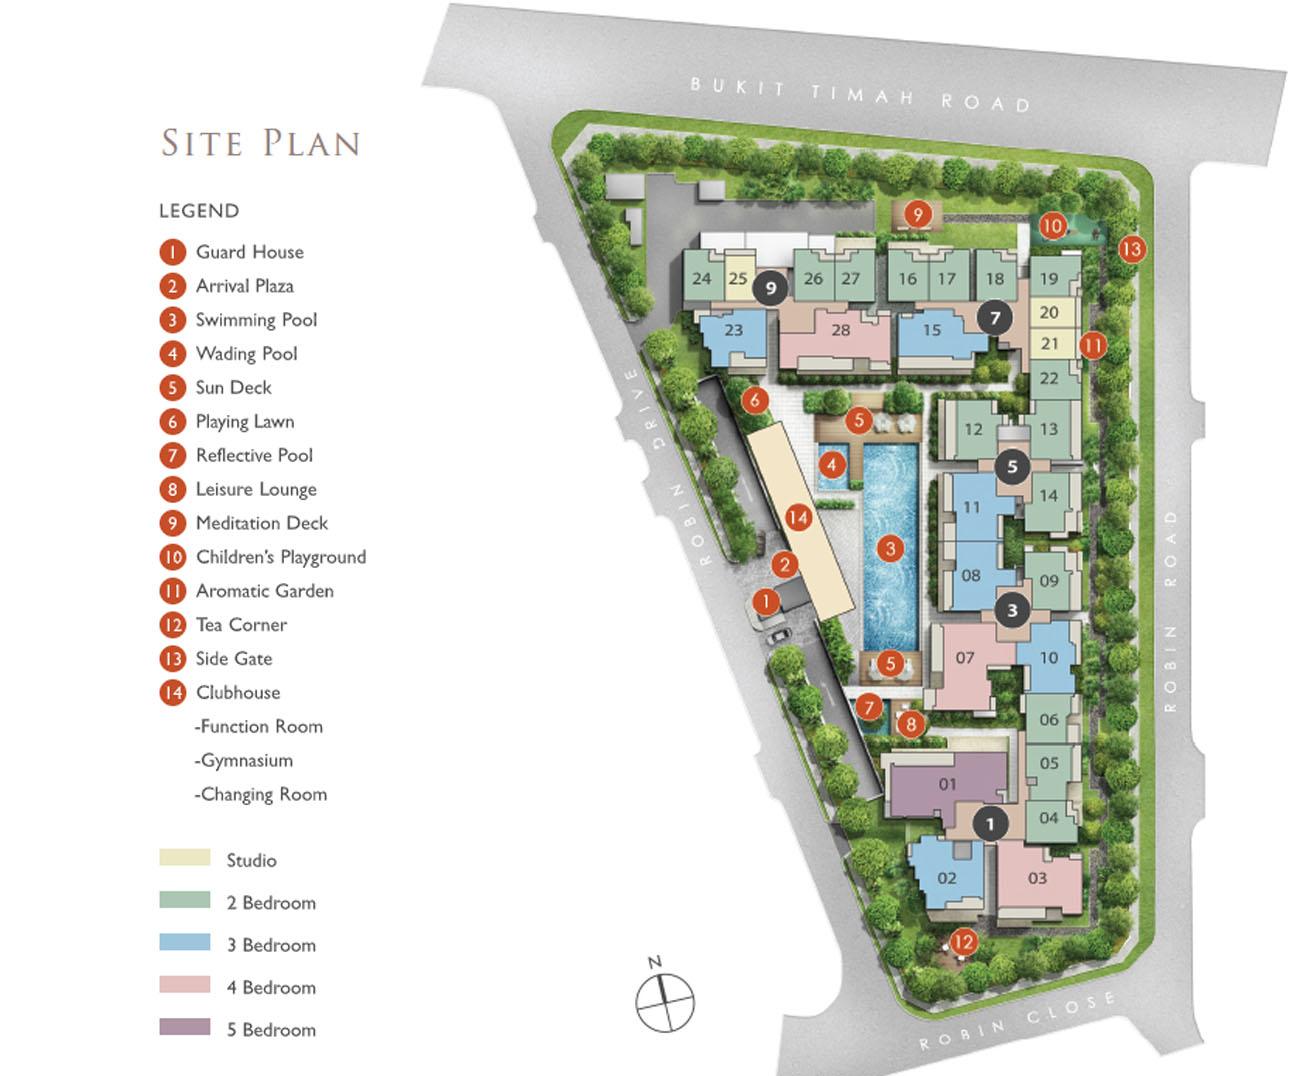 robin residences development site